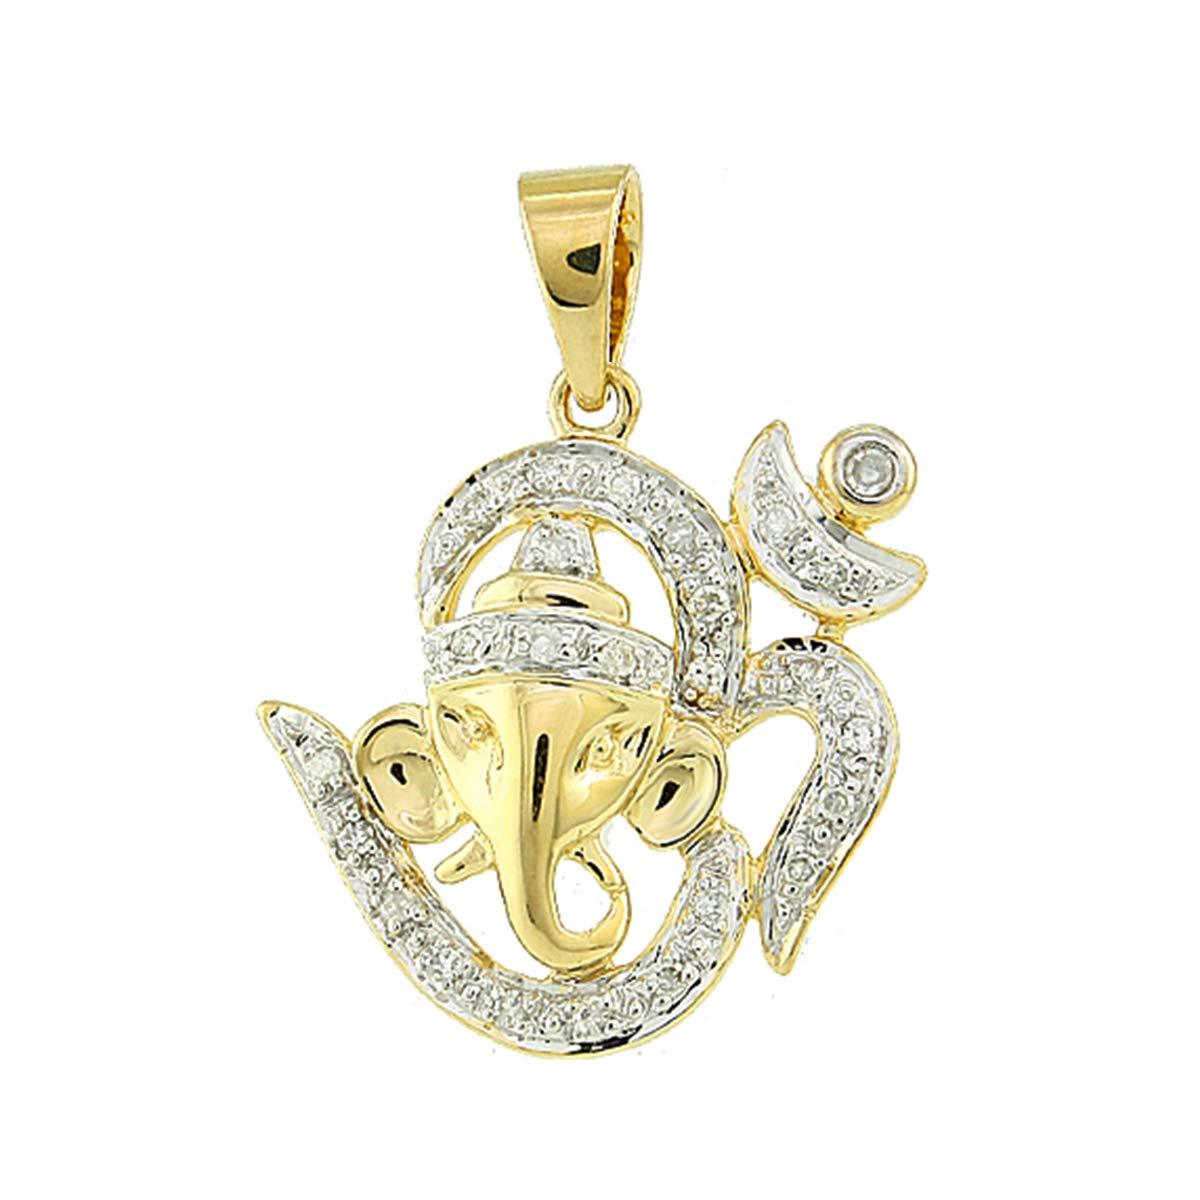 Solid 14K Yellow Gold 0.10 Ct Round Cut Natural Diamond Om /& Ganesha Pendant